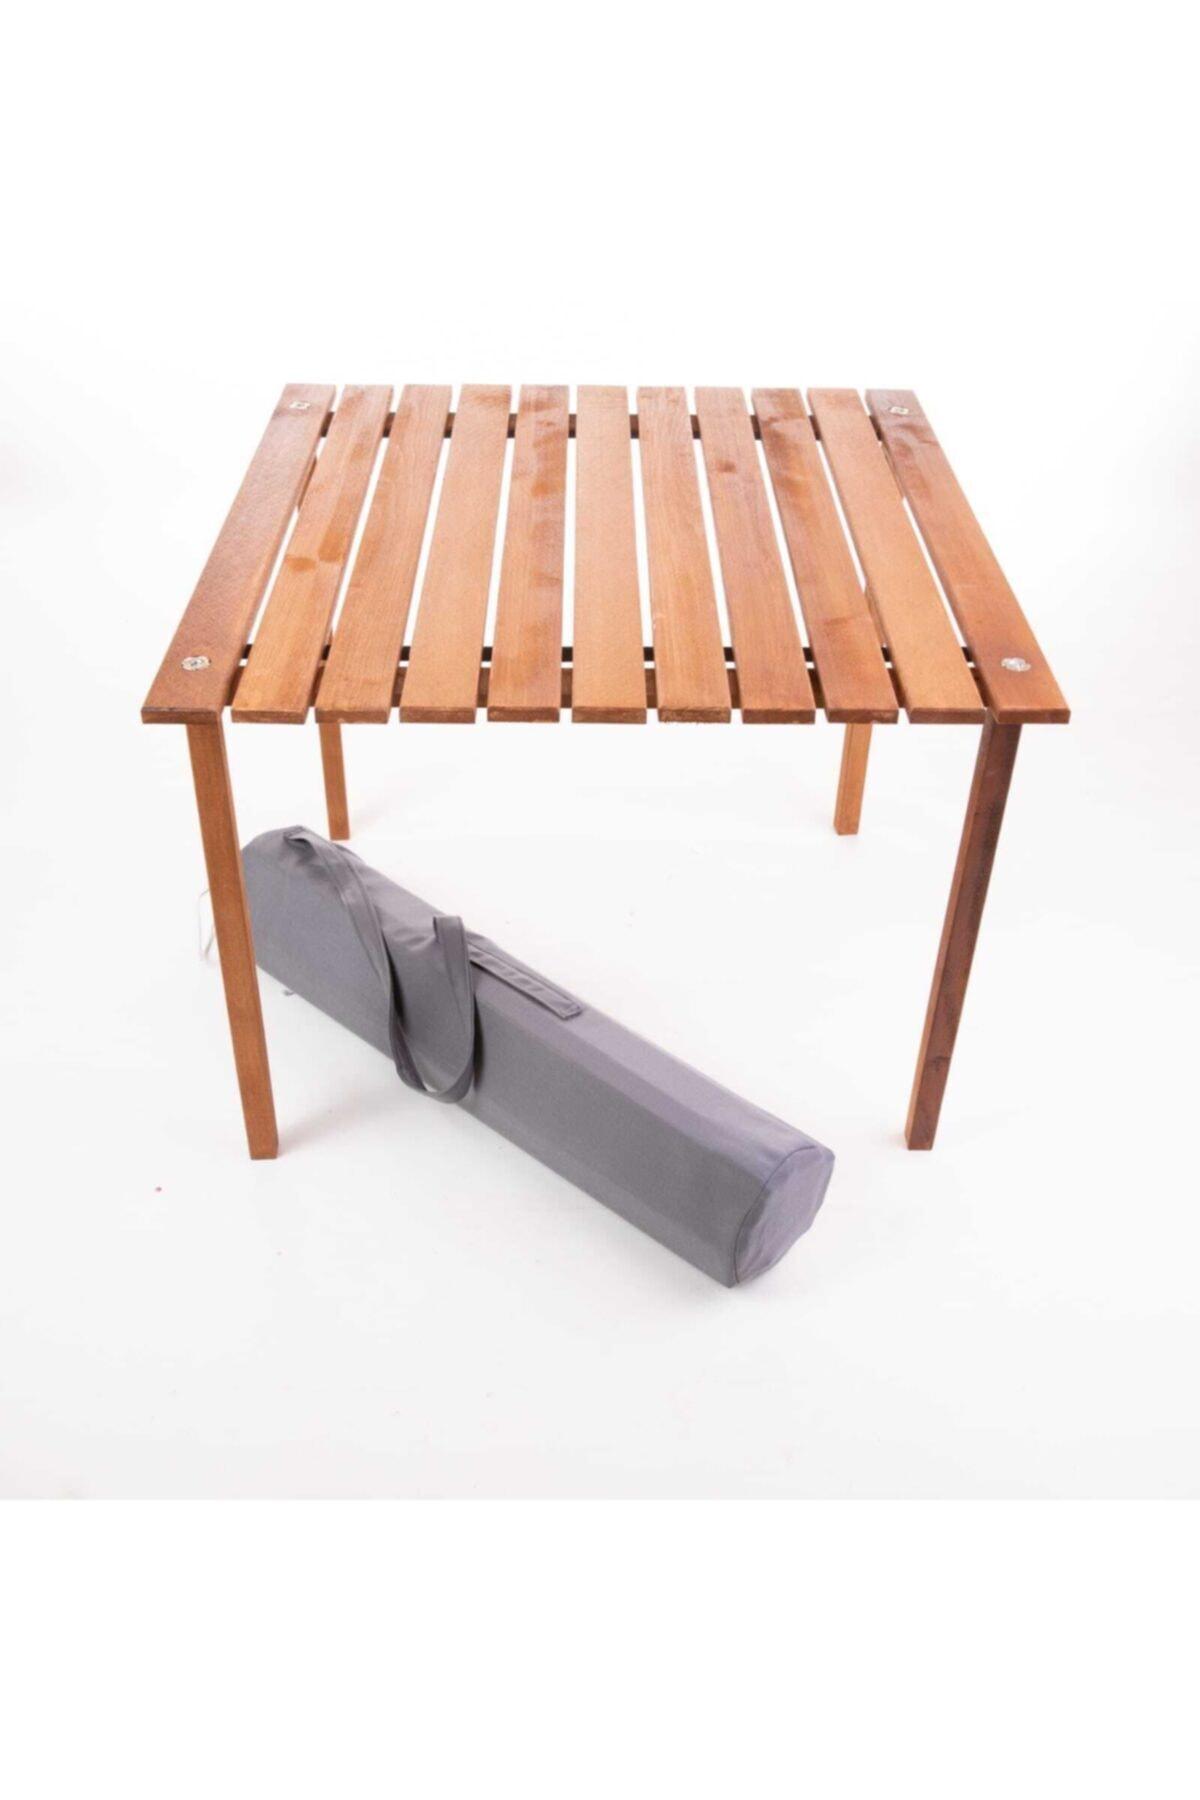 Aura Çantalı Rulo Katlanabilir Kamp - Piknik Masası 70x70